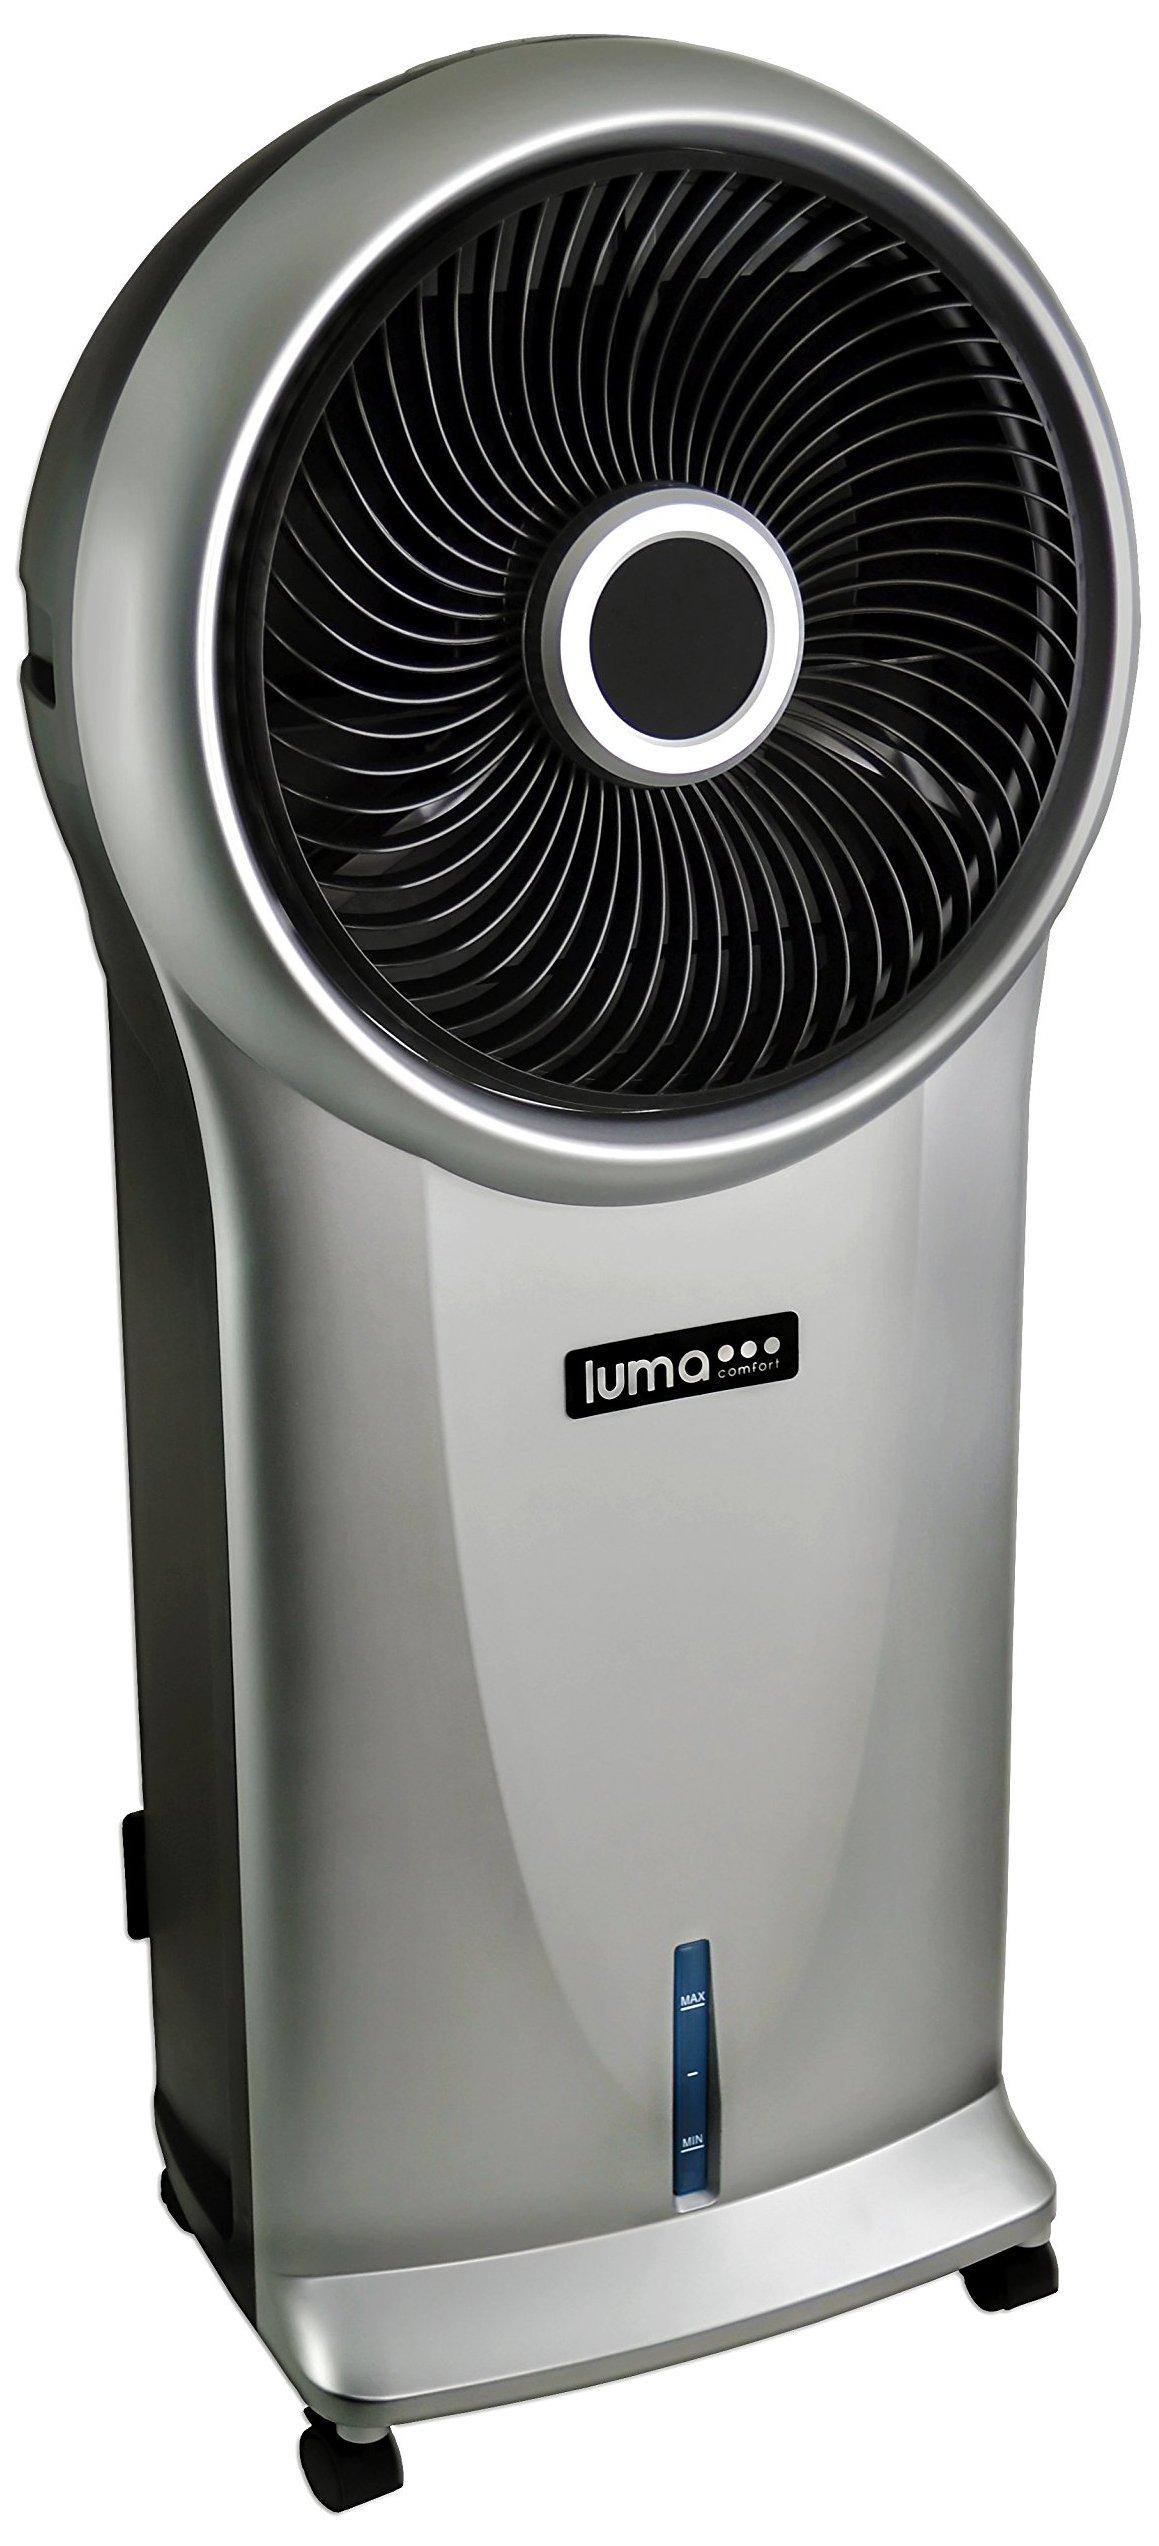 Luma Comfort EC110S Portable Evaporative